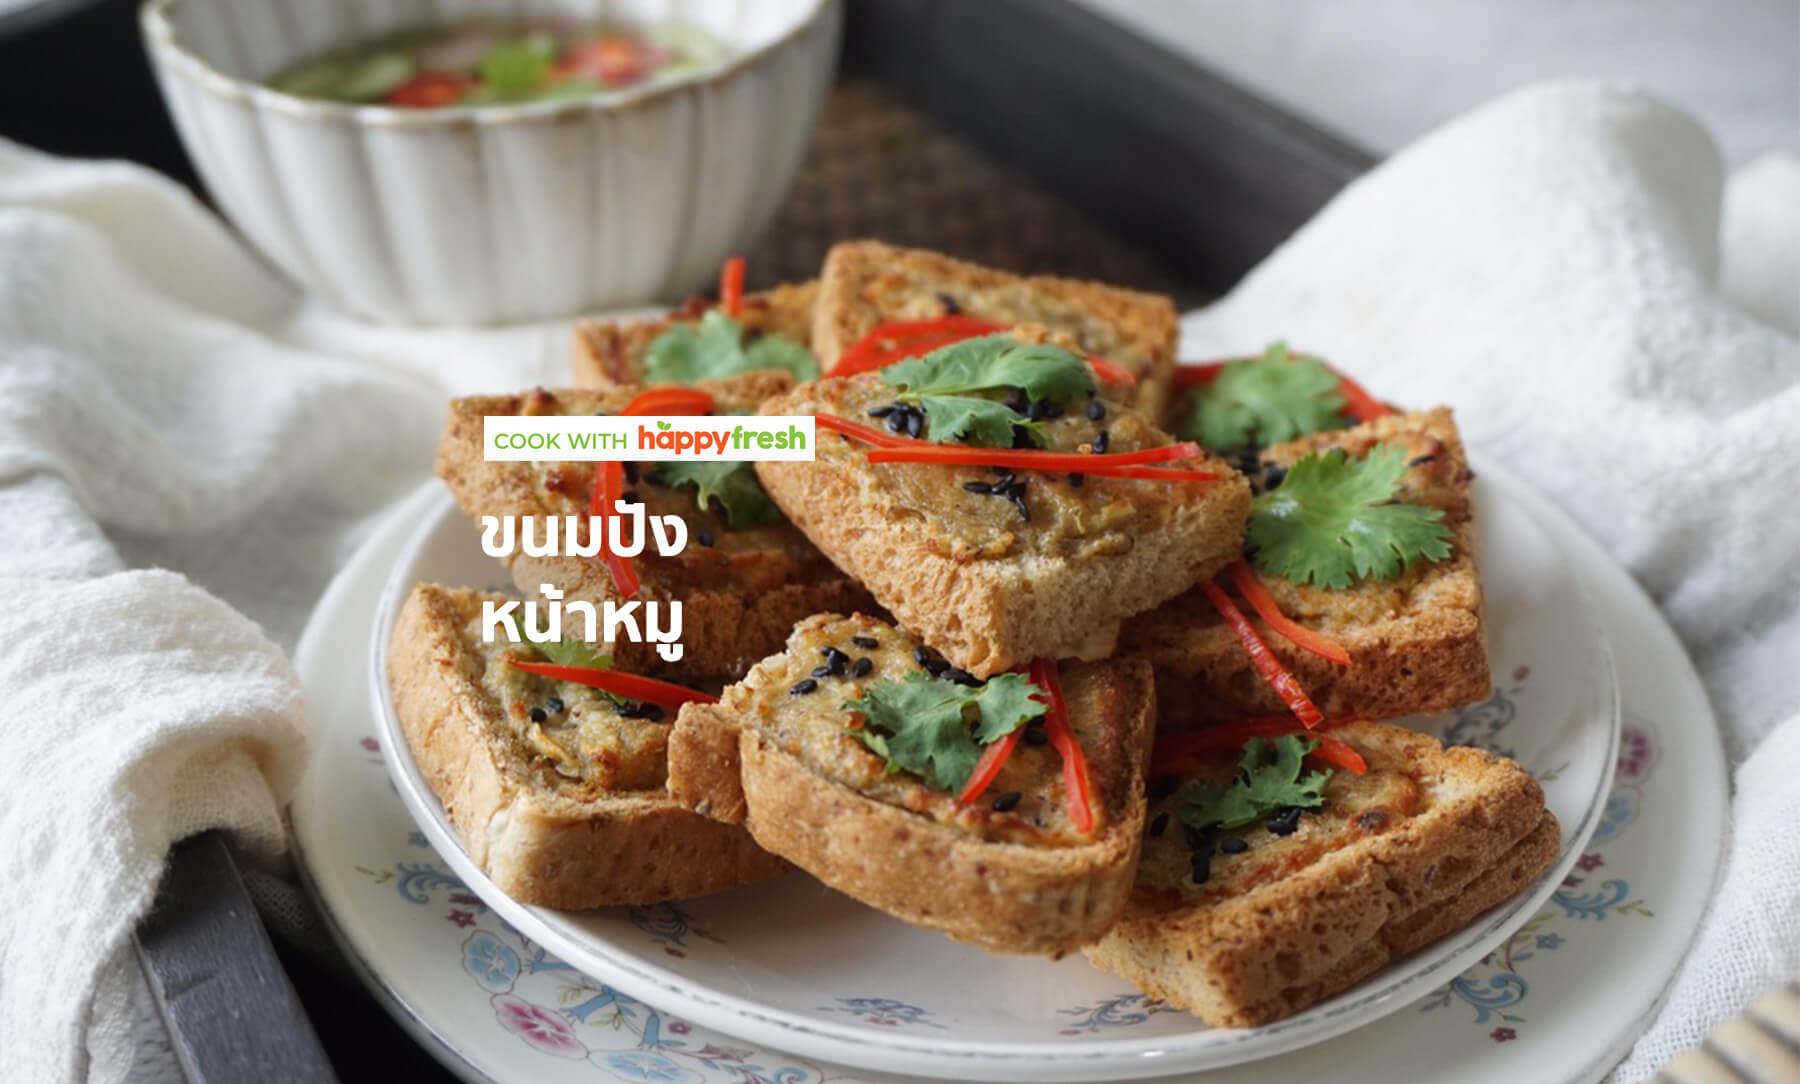 HappyFresh_Feature_Image_Fried_Minced_Pork_Toast